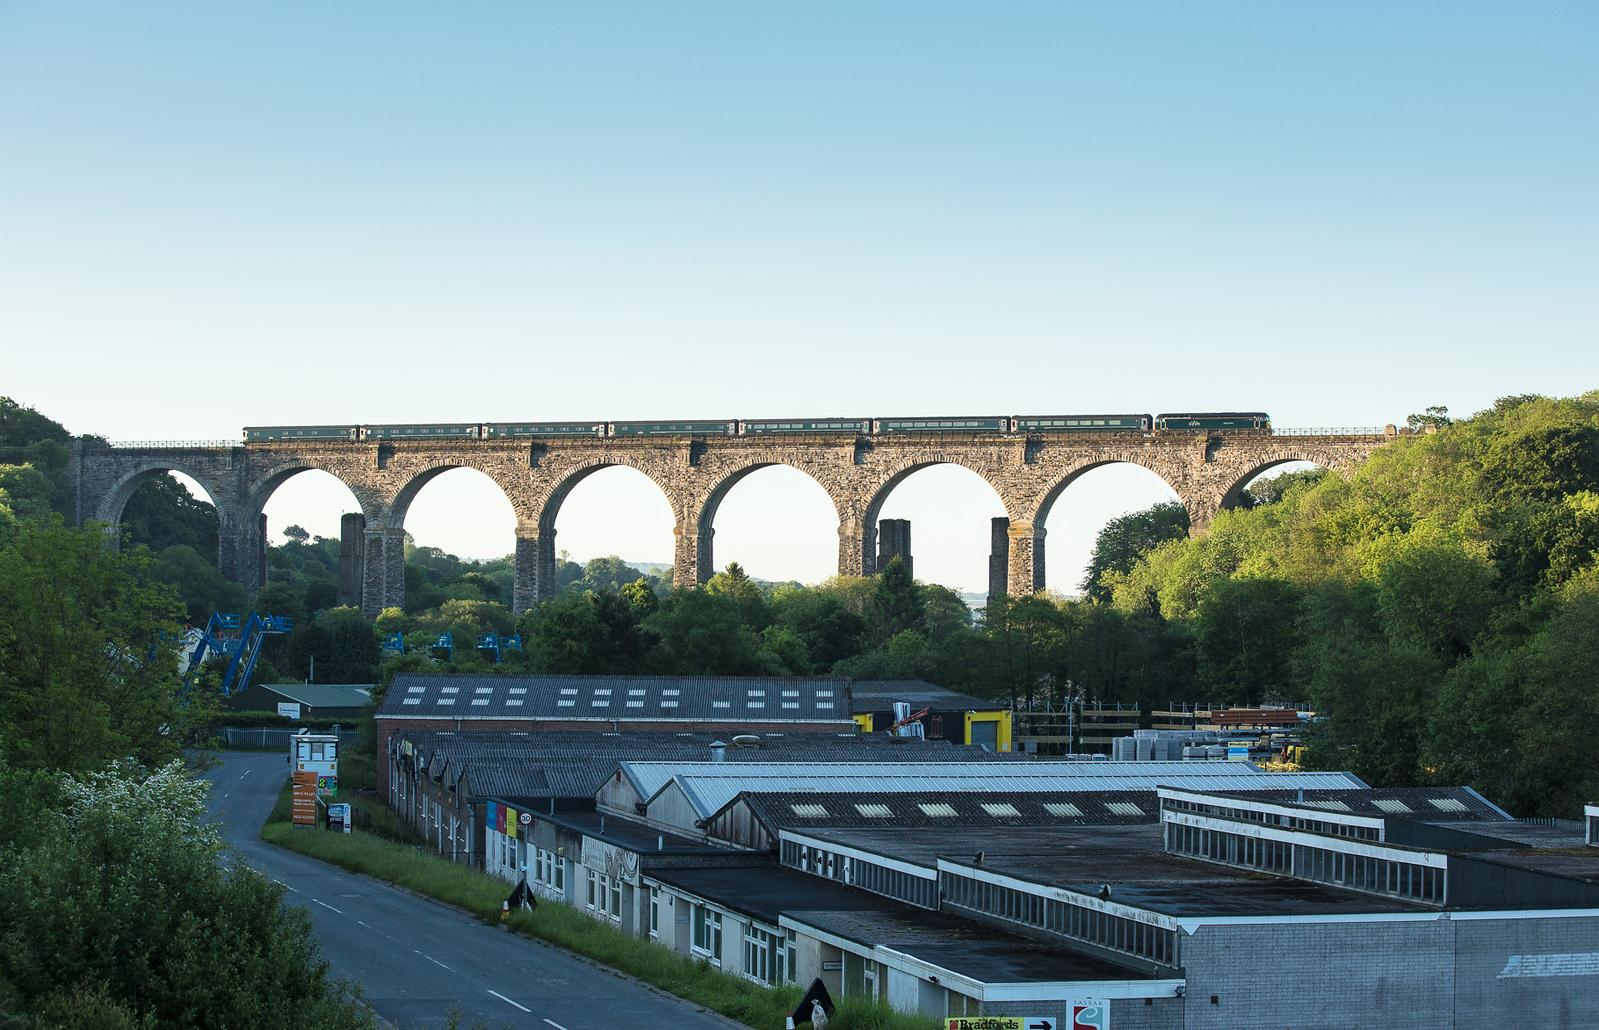 260517  57602 crosses Moorswater Viaduct with the down sleeper, 1C99   23:45 Paddington-Penzance